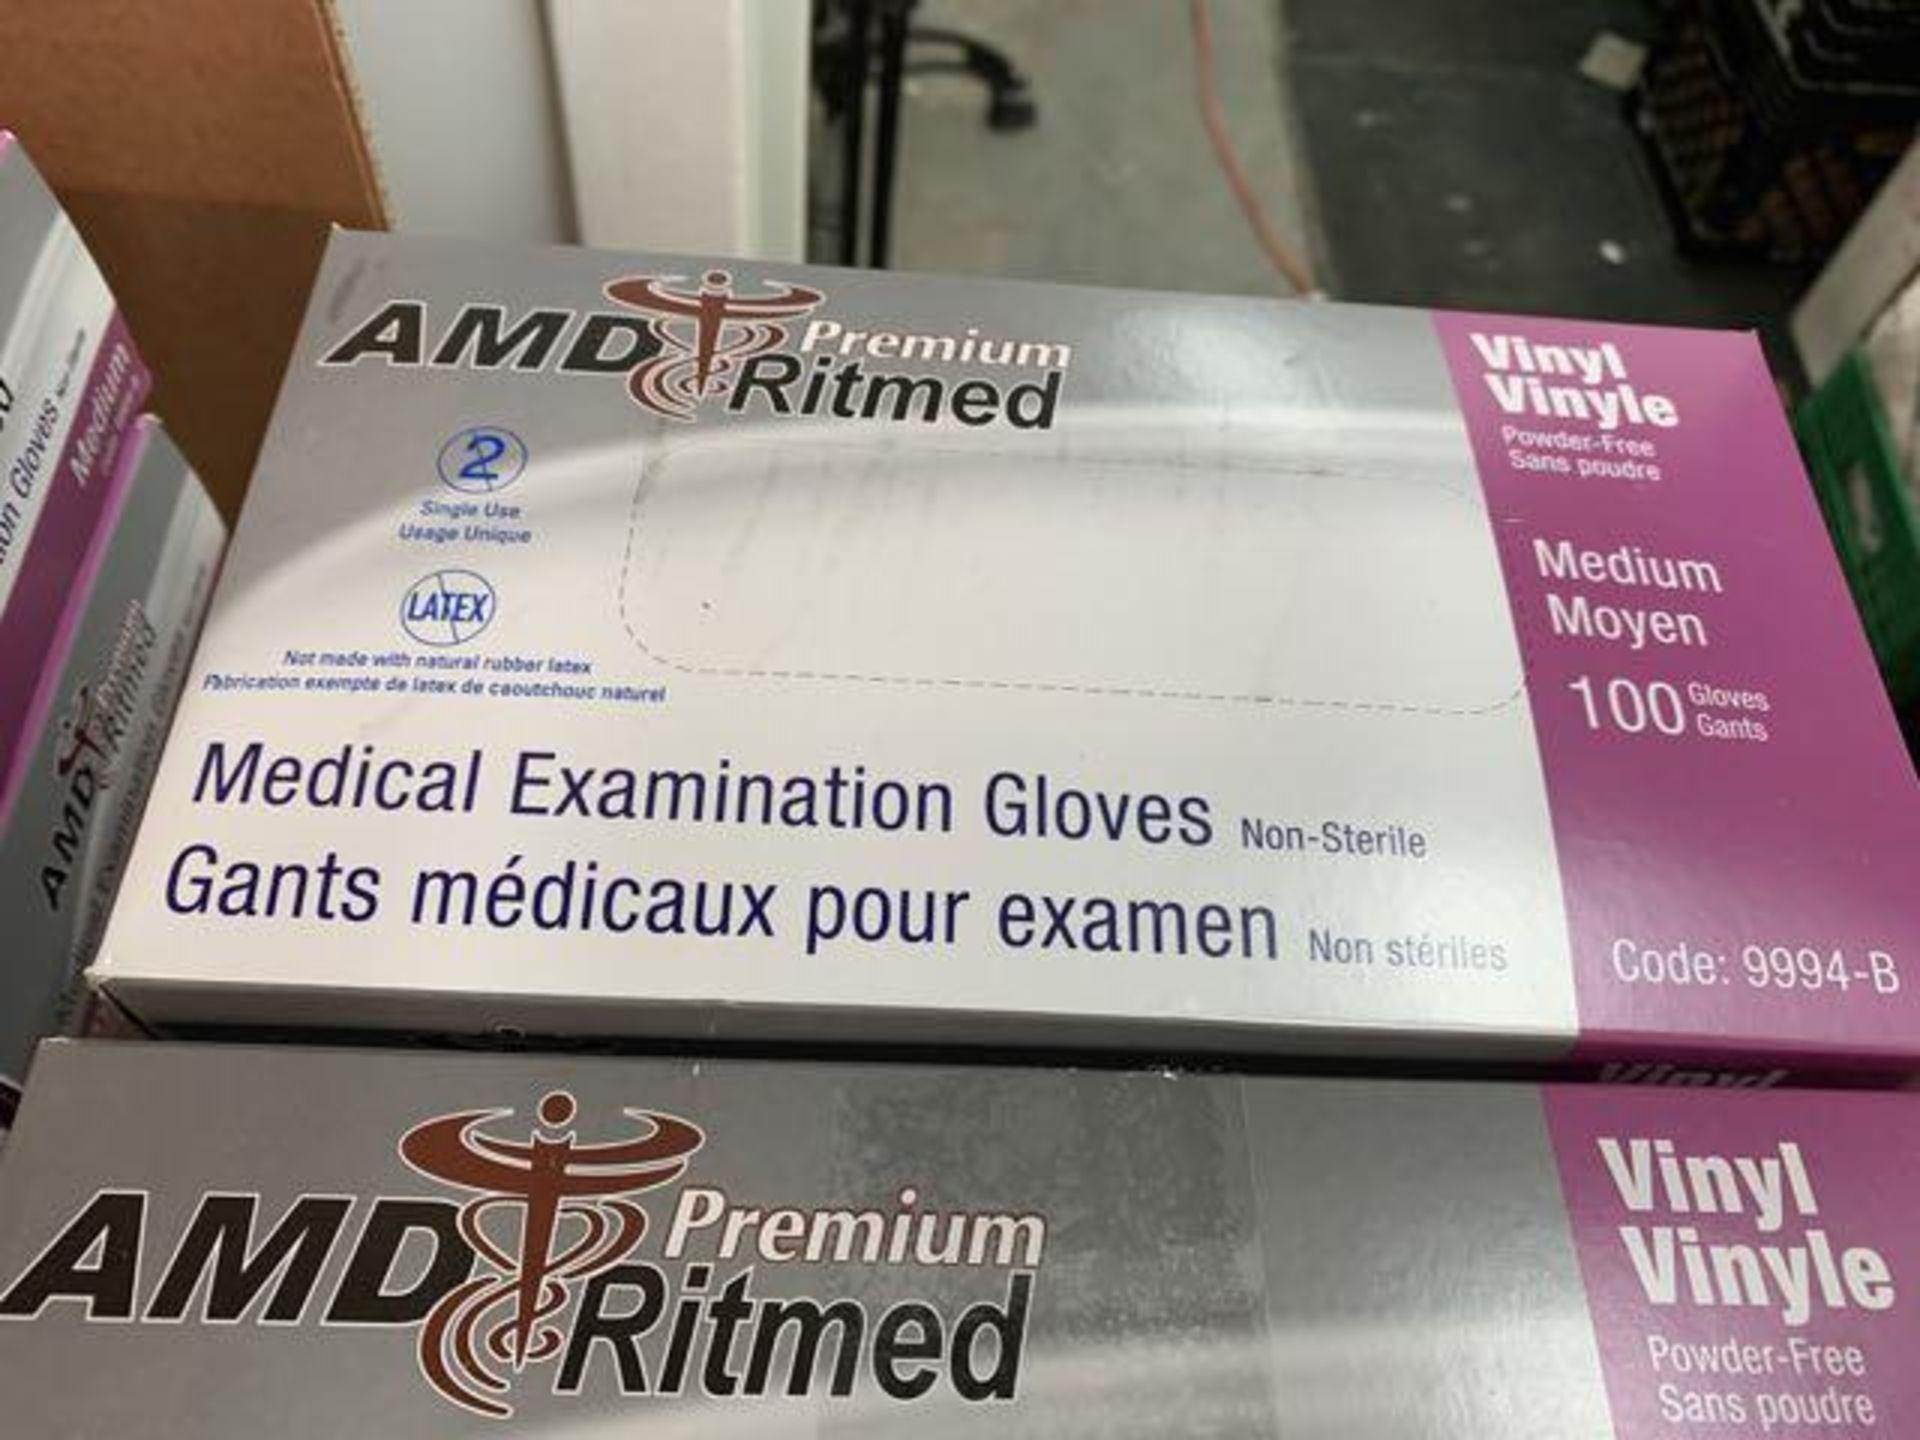 (6) Boites de gants medicaux AMD